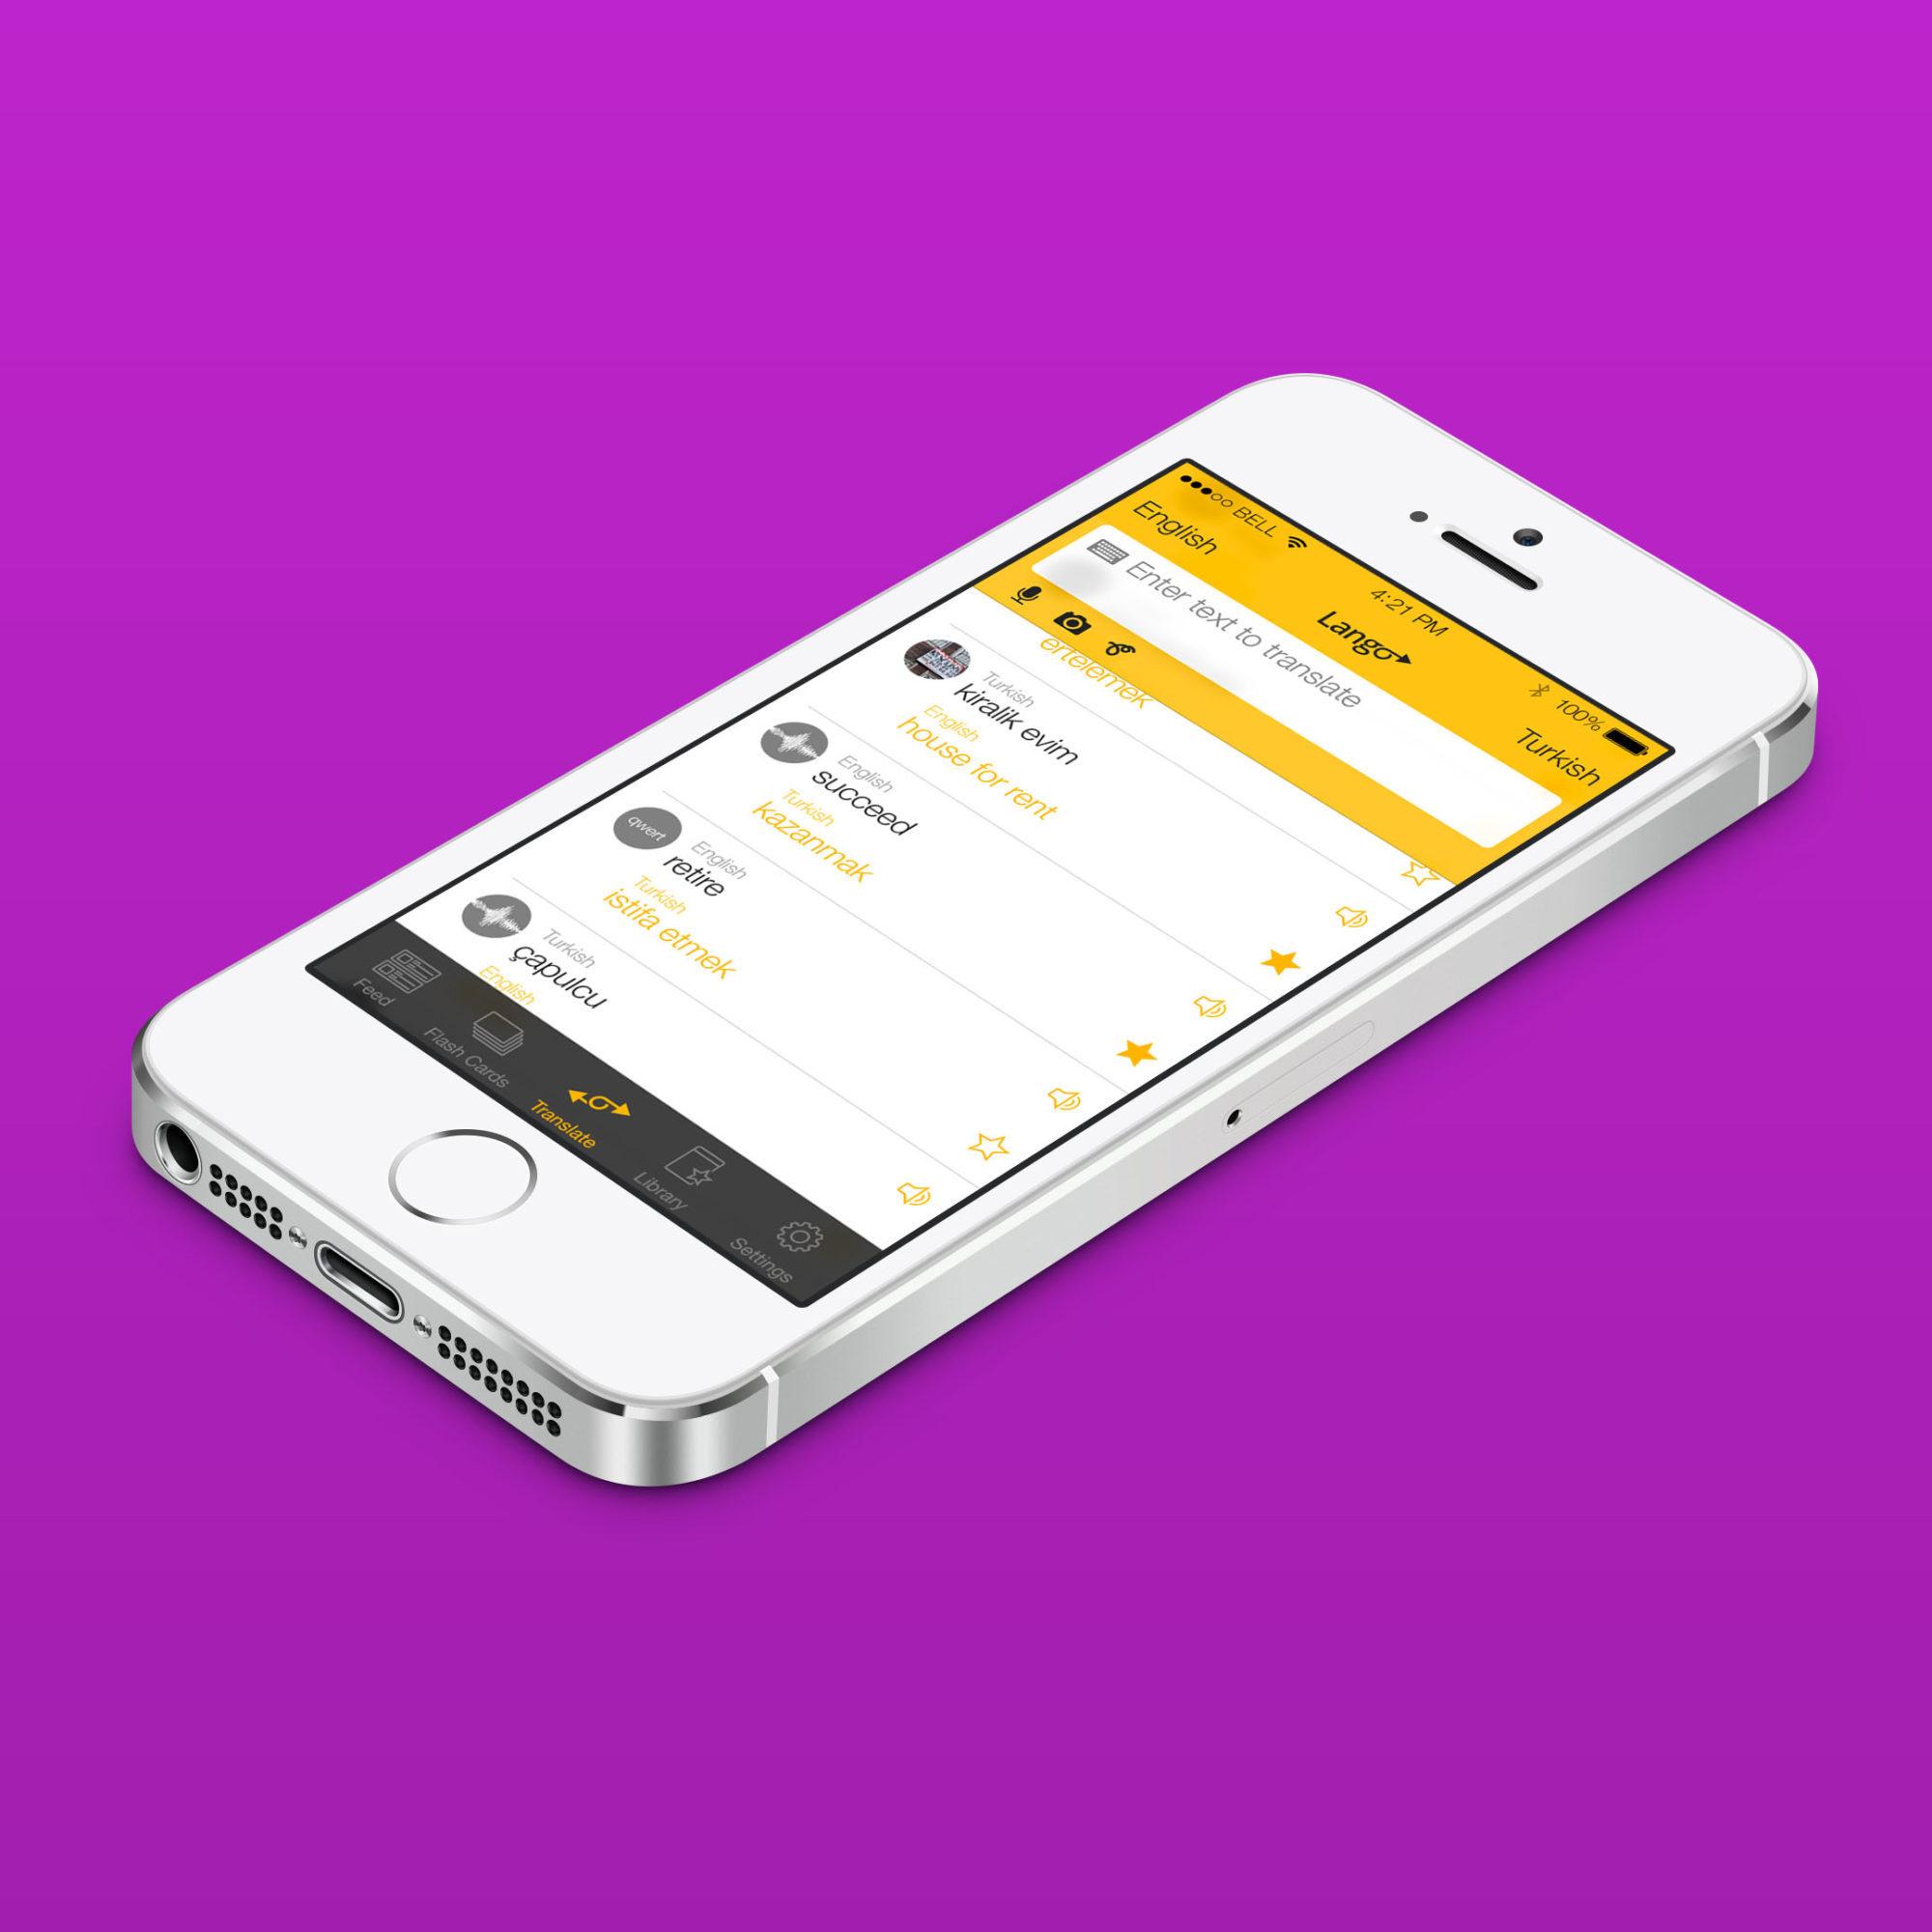 Lango universal translator app